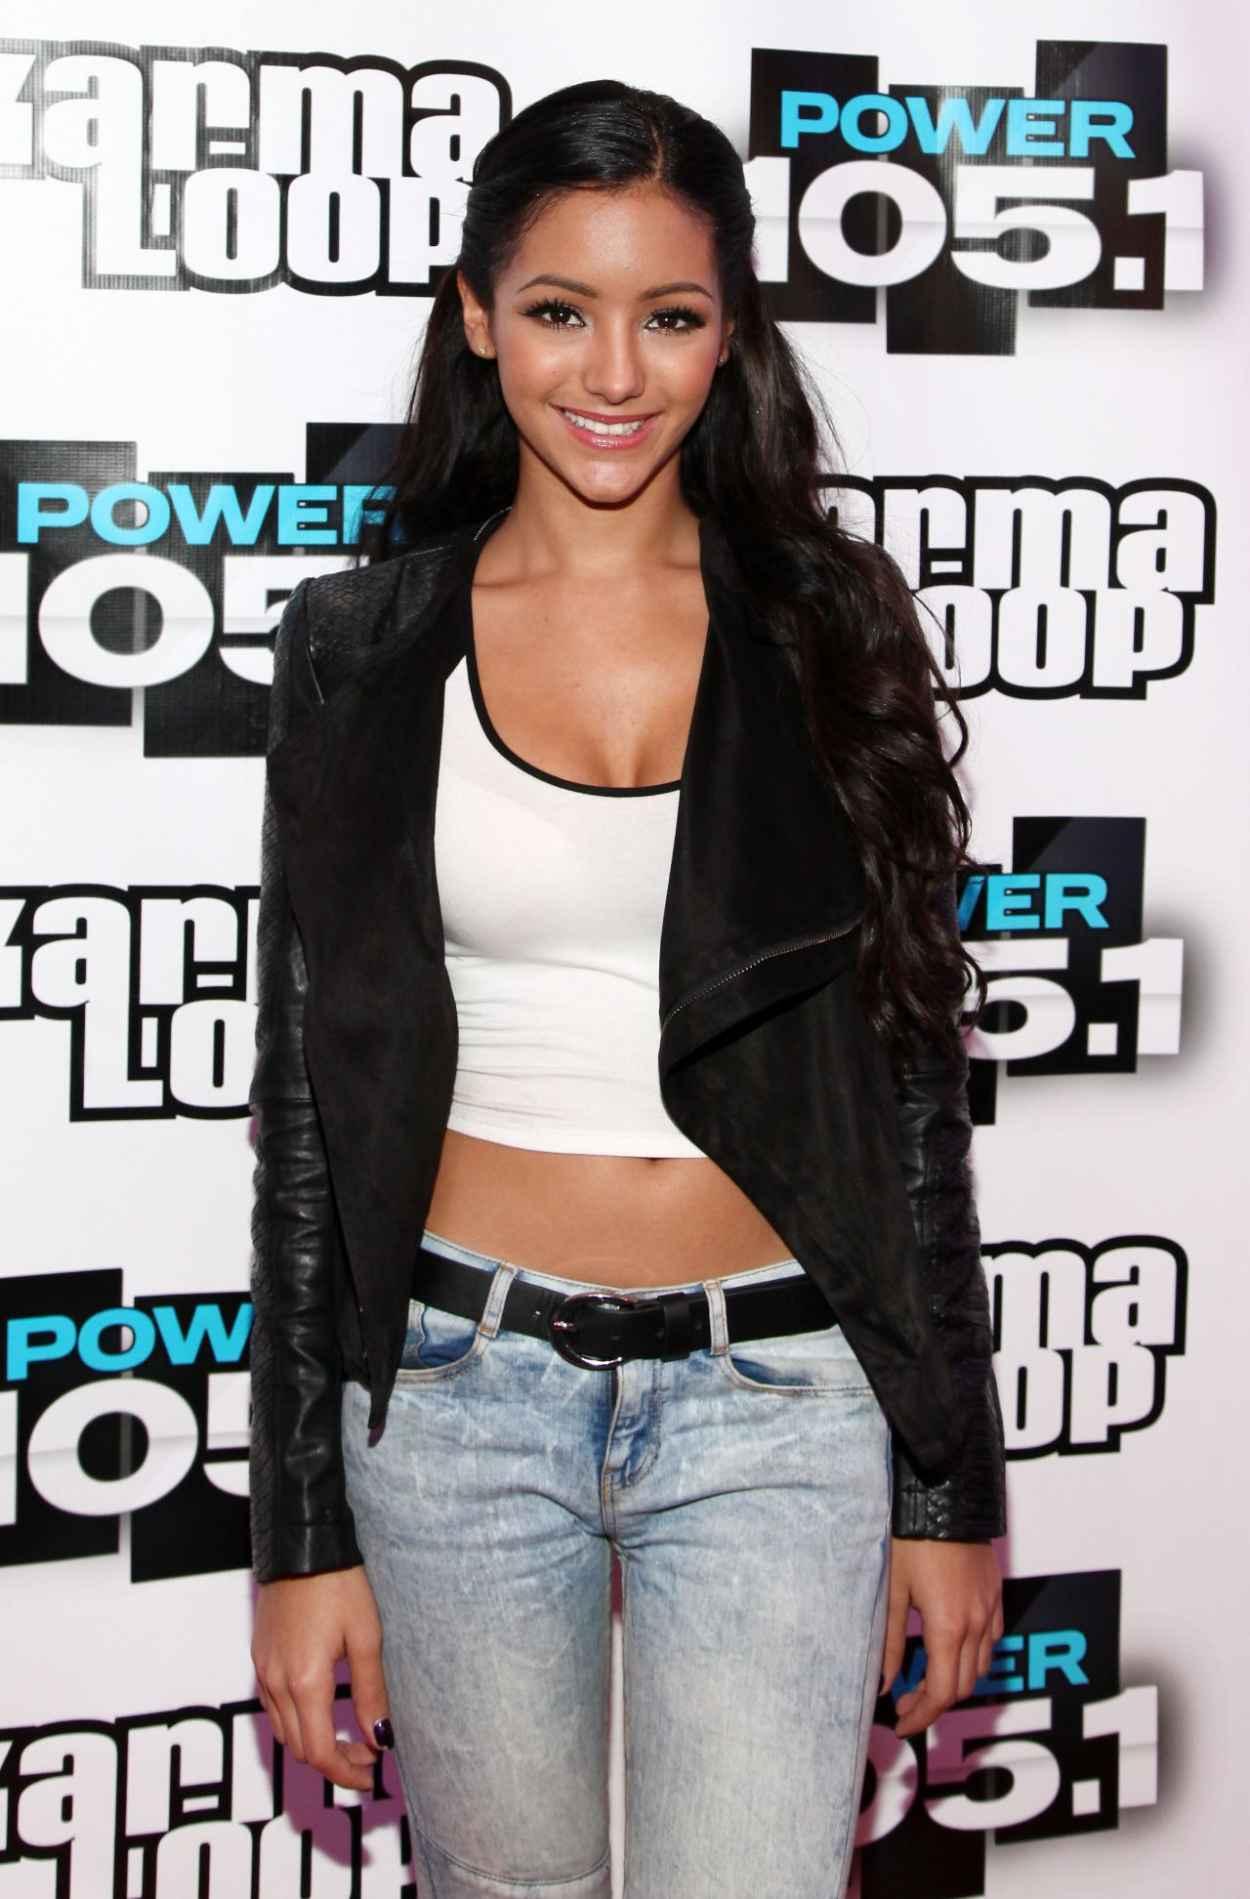 Melanie Iglesias at Power 105.1s Powerhouse 2015-1